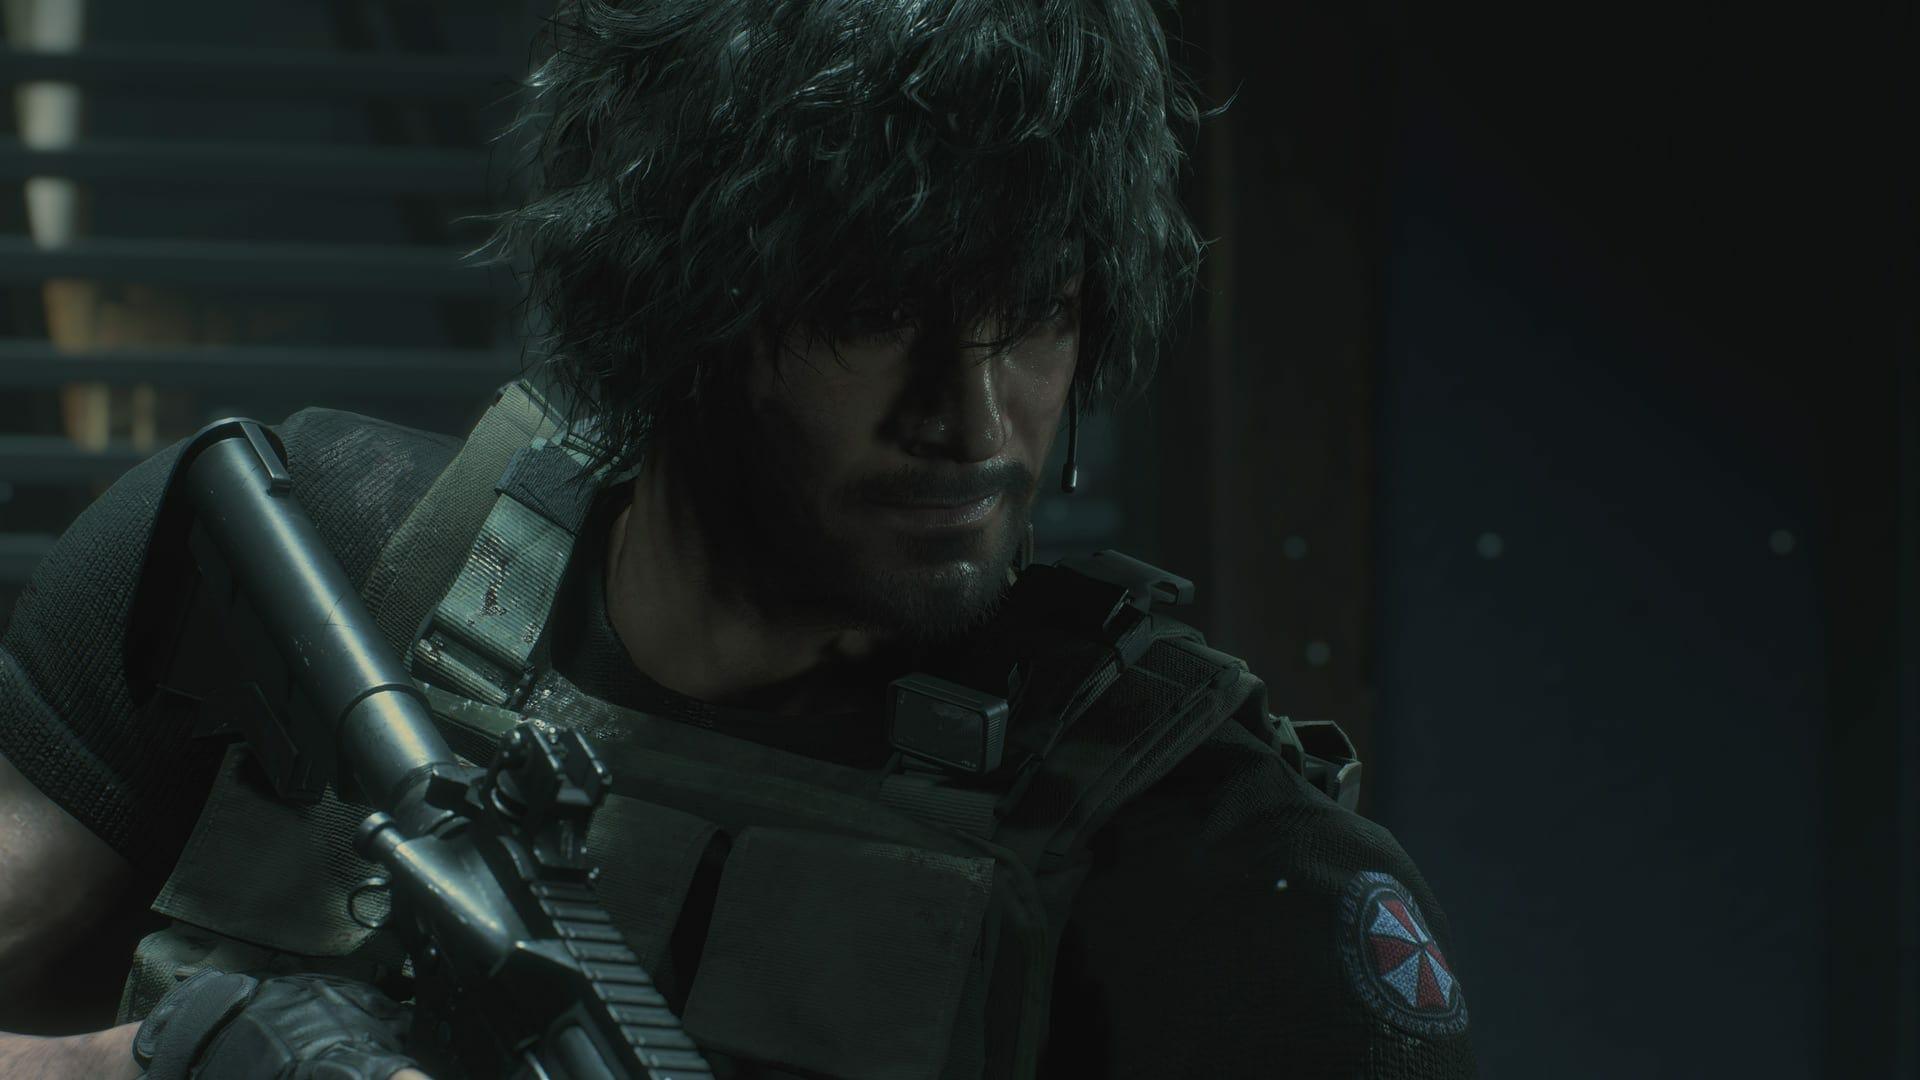 Screnshot 10 - Resident Evil 3 Remake: Release date, Pre-Order and Project Resistance Details Revealed